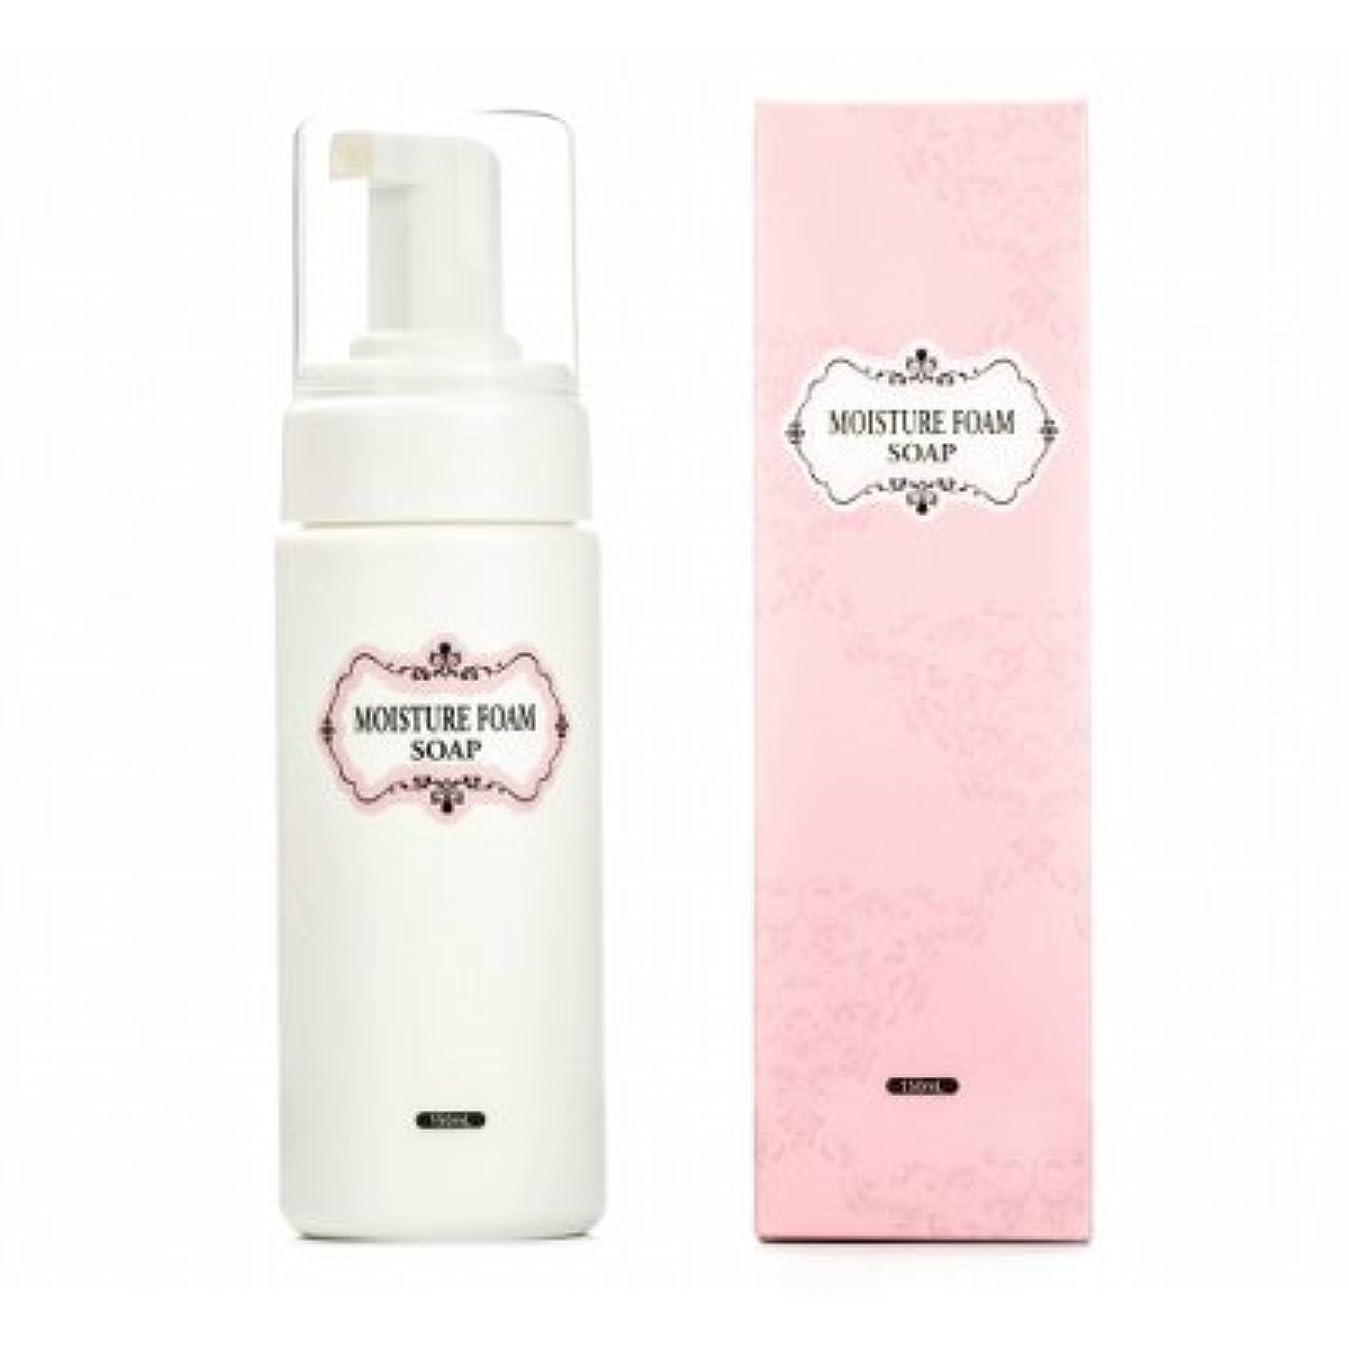 MOISTURE FOAM SOAP(モイスチャーフォームソープ) 150ml